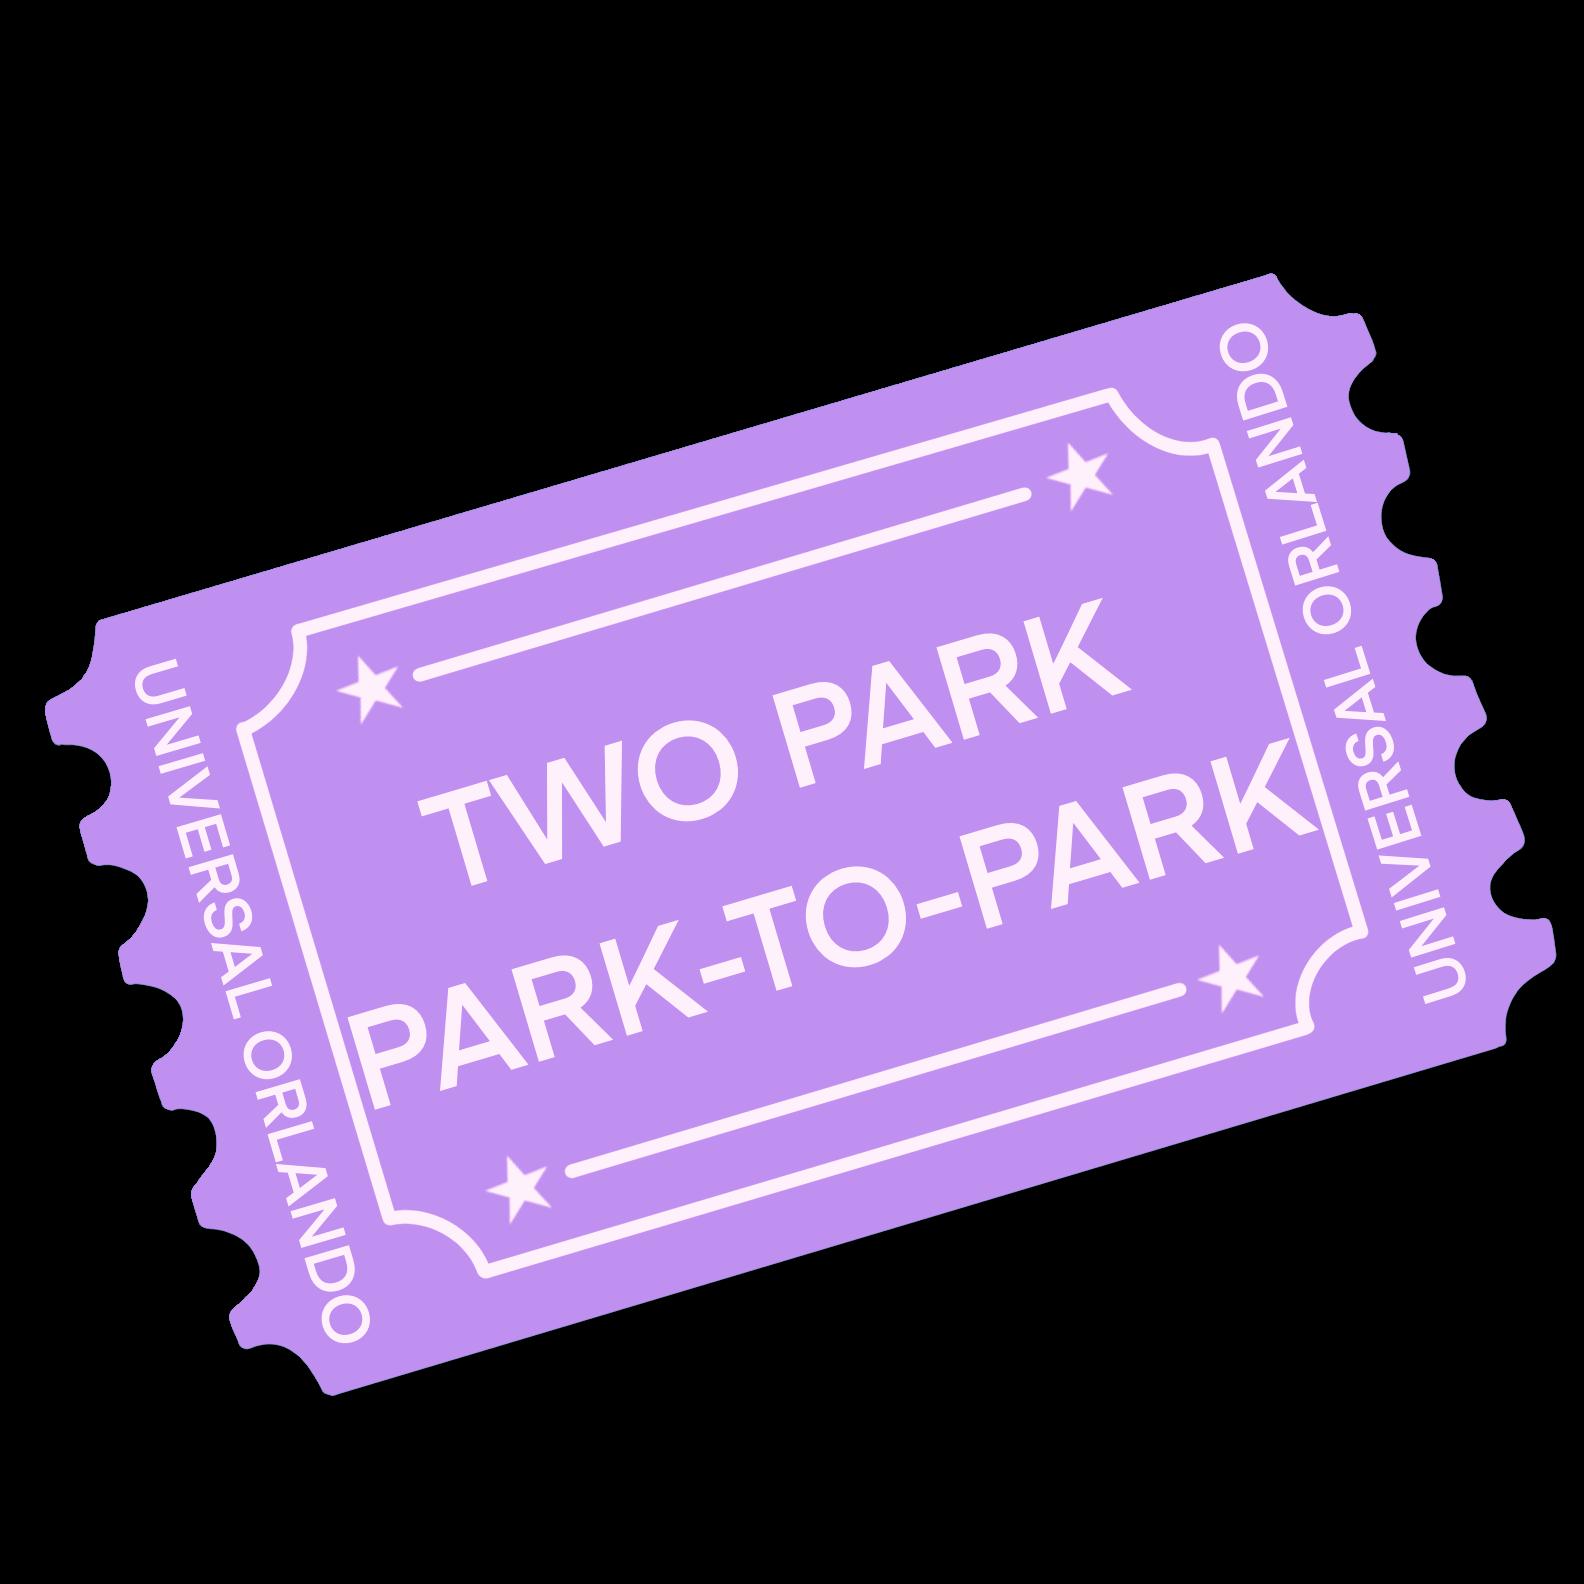 universal-2-park-base-ticket